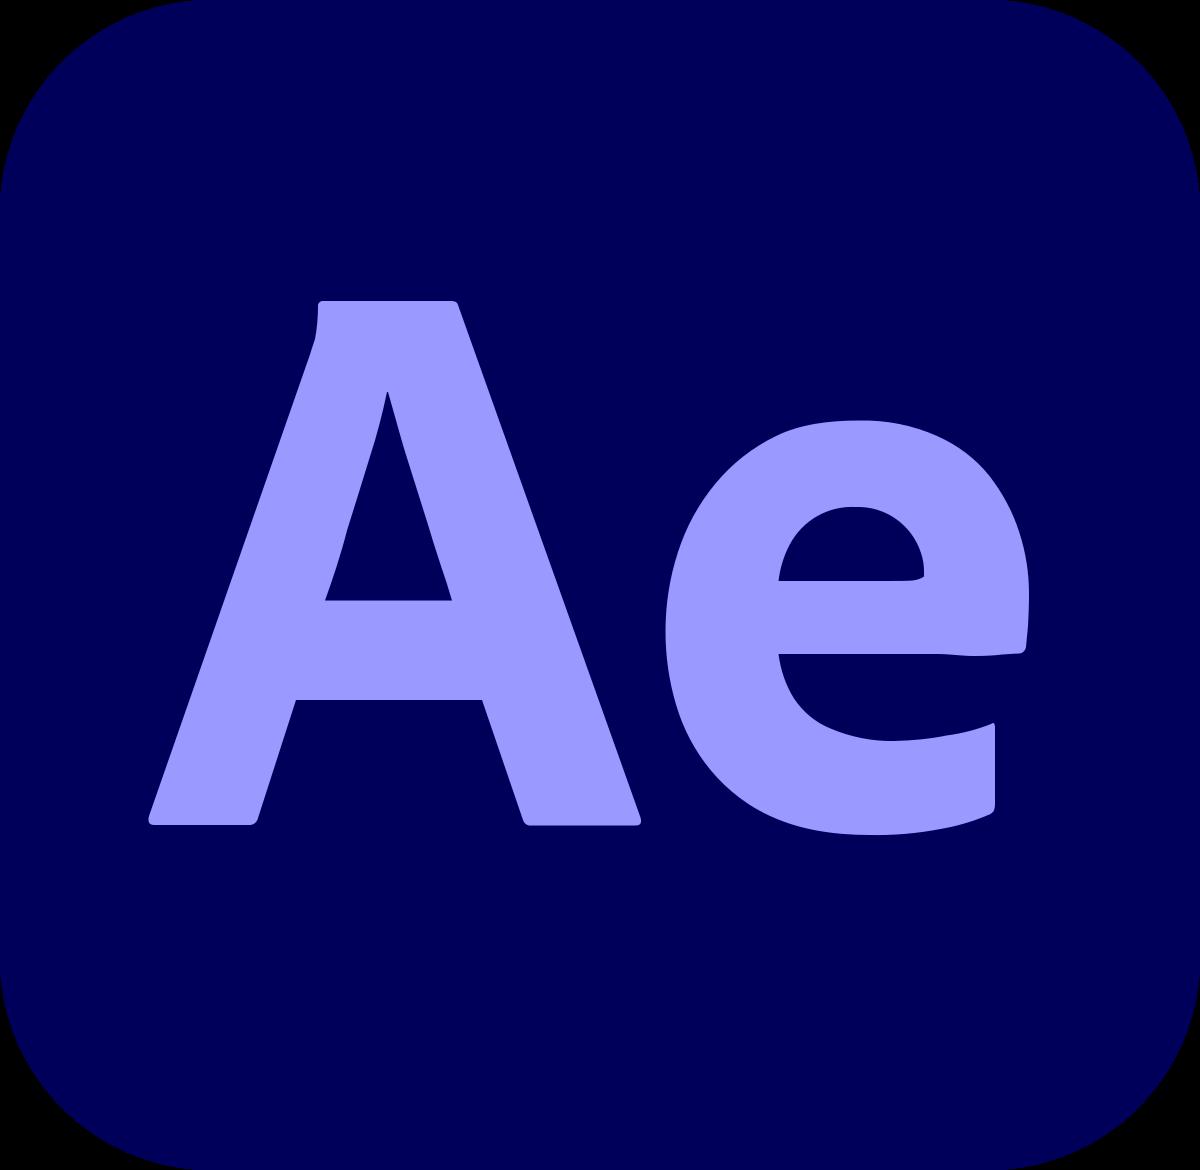 Adobe After Effects Single App